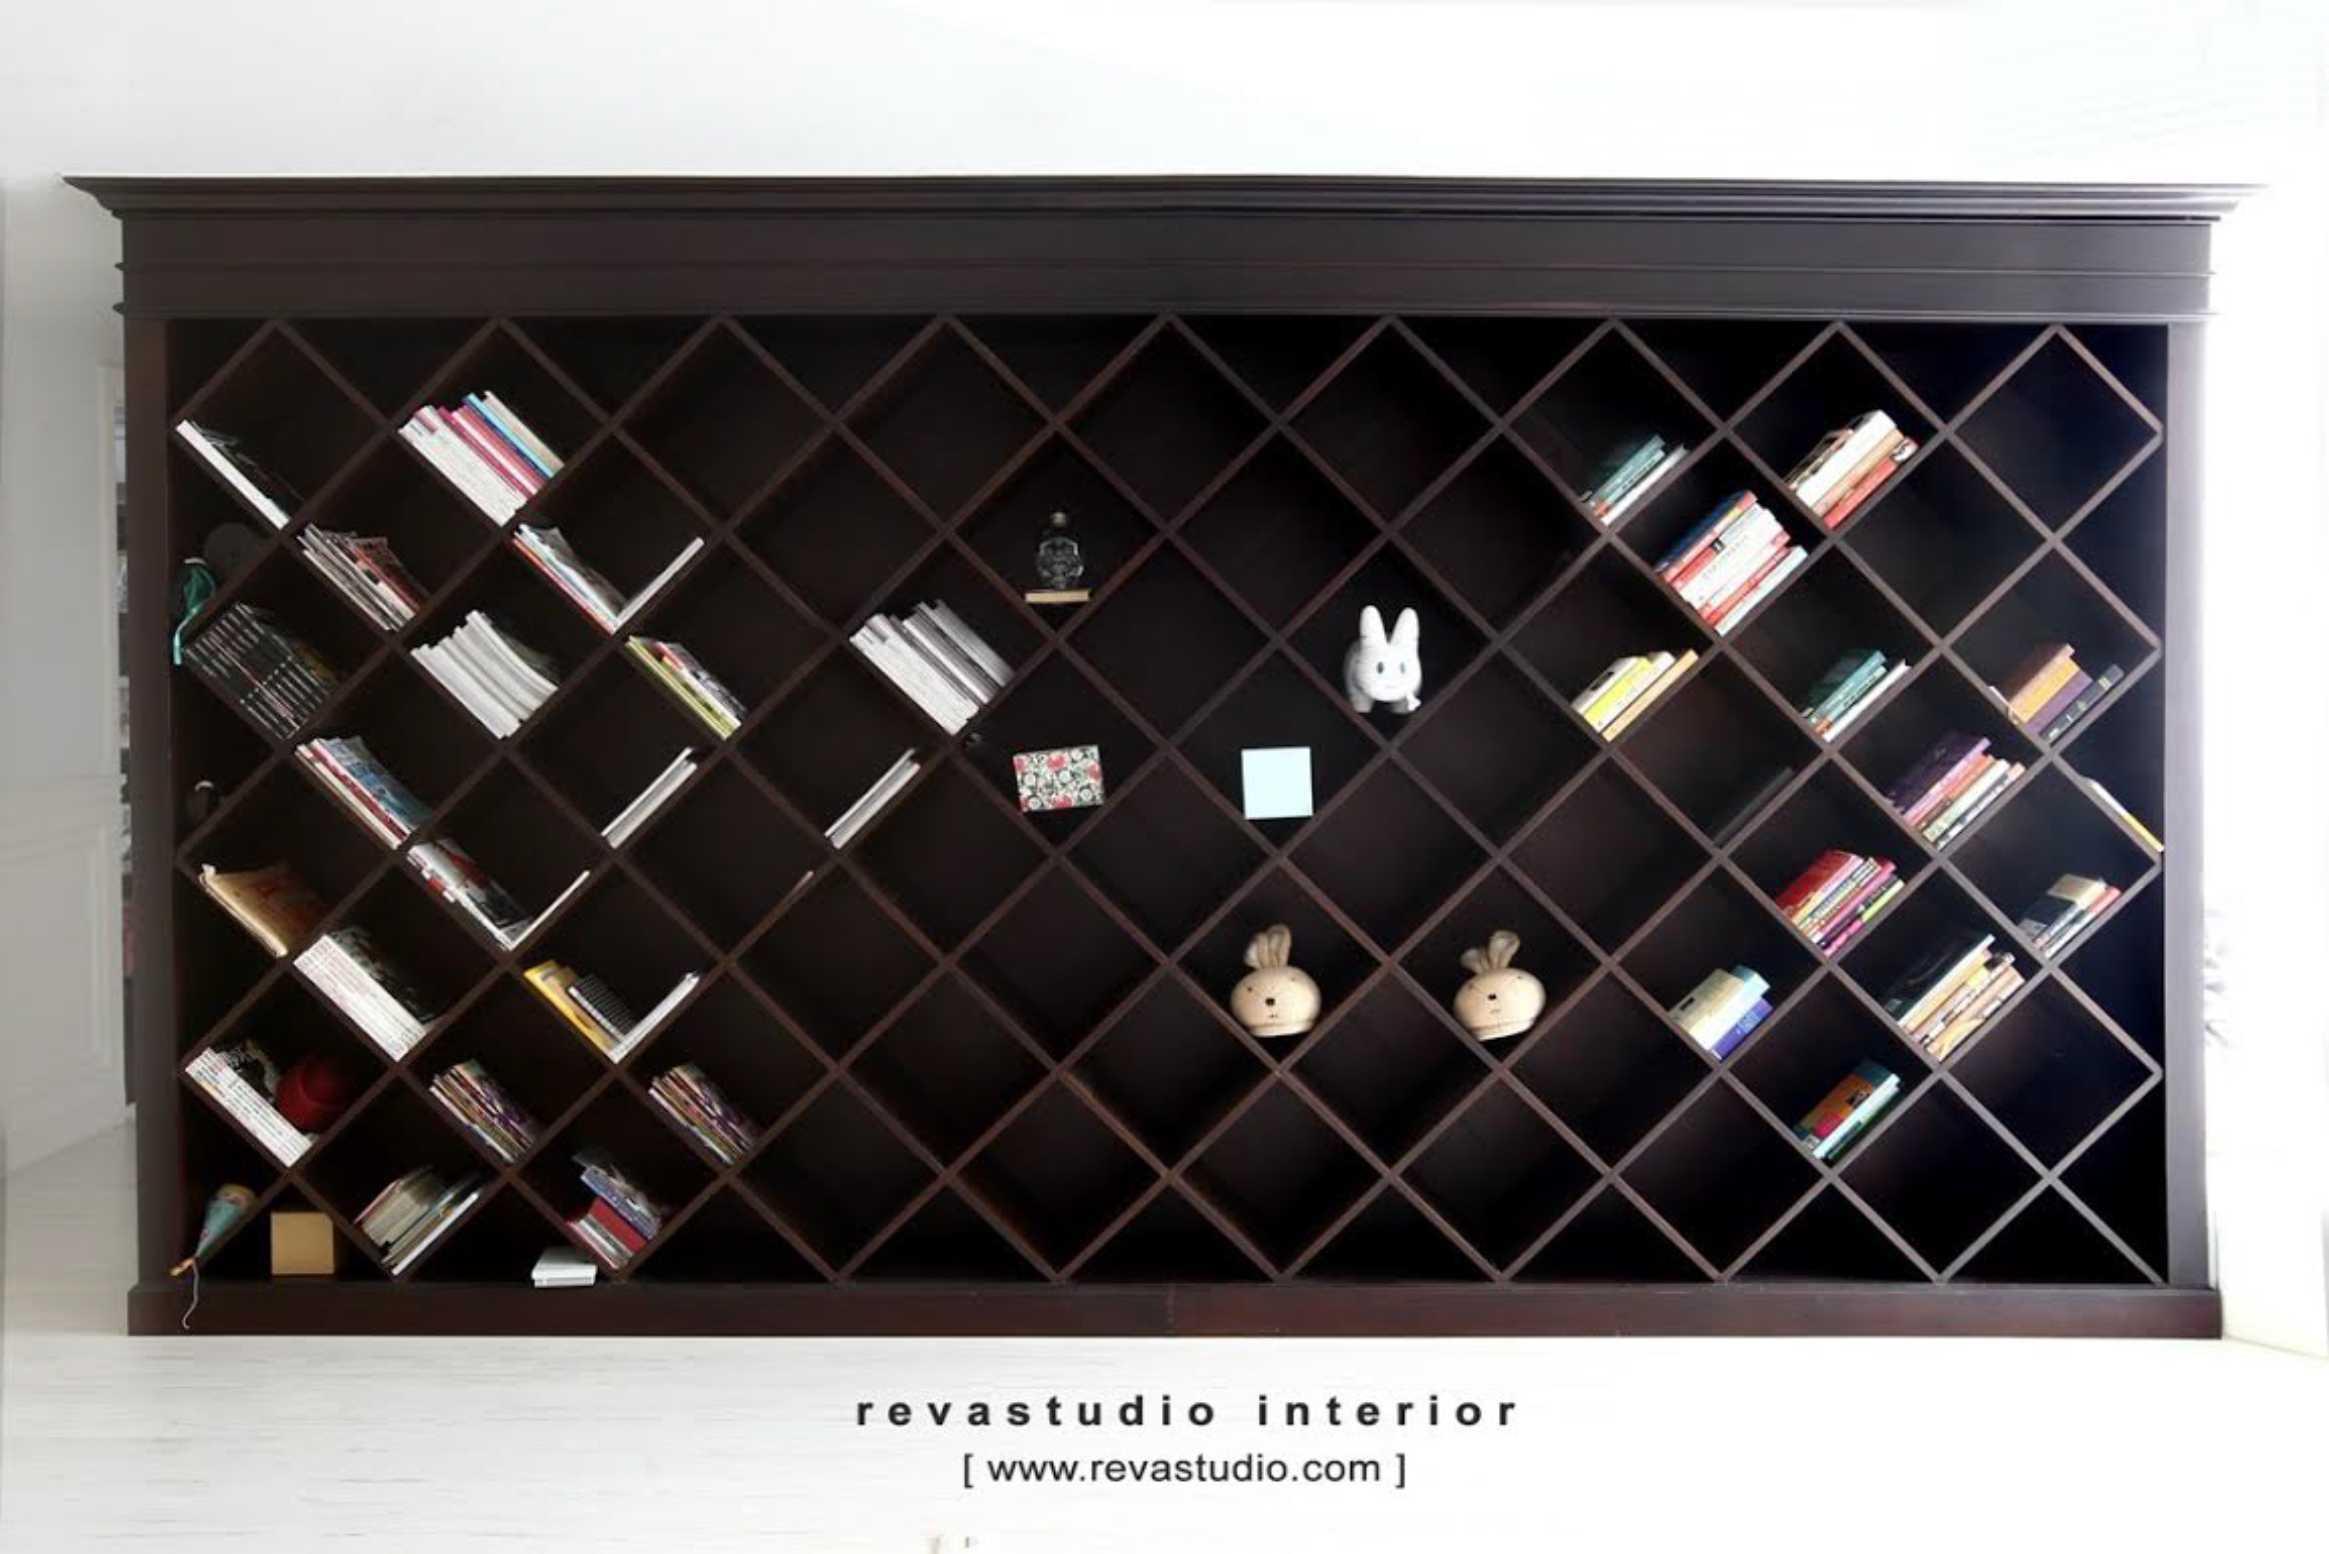 Revano Satria The Lego Apartment Jakarta, Indonesia Jakarta, Indonesia Living Room Bookcase   15522